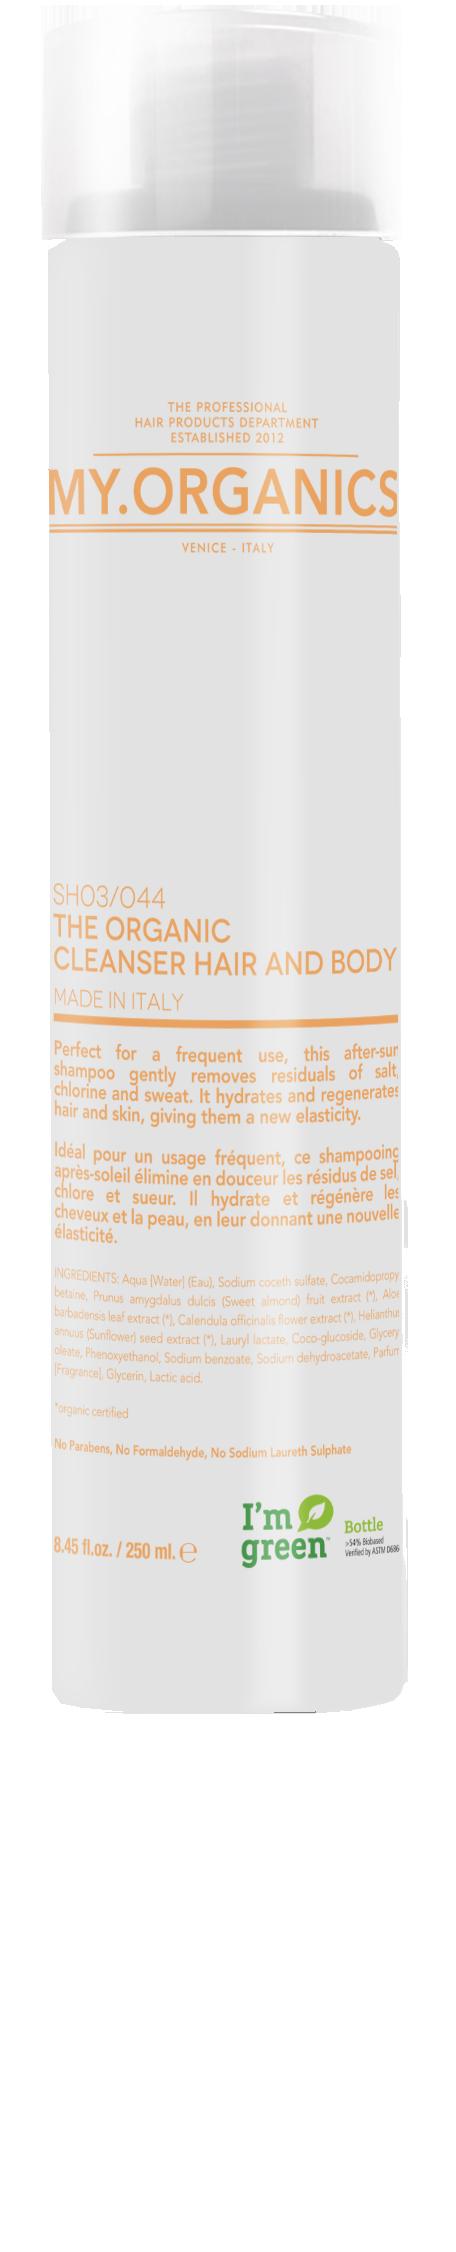 My.Tan Cleanser hair and body MY.ORGANICS